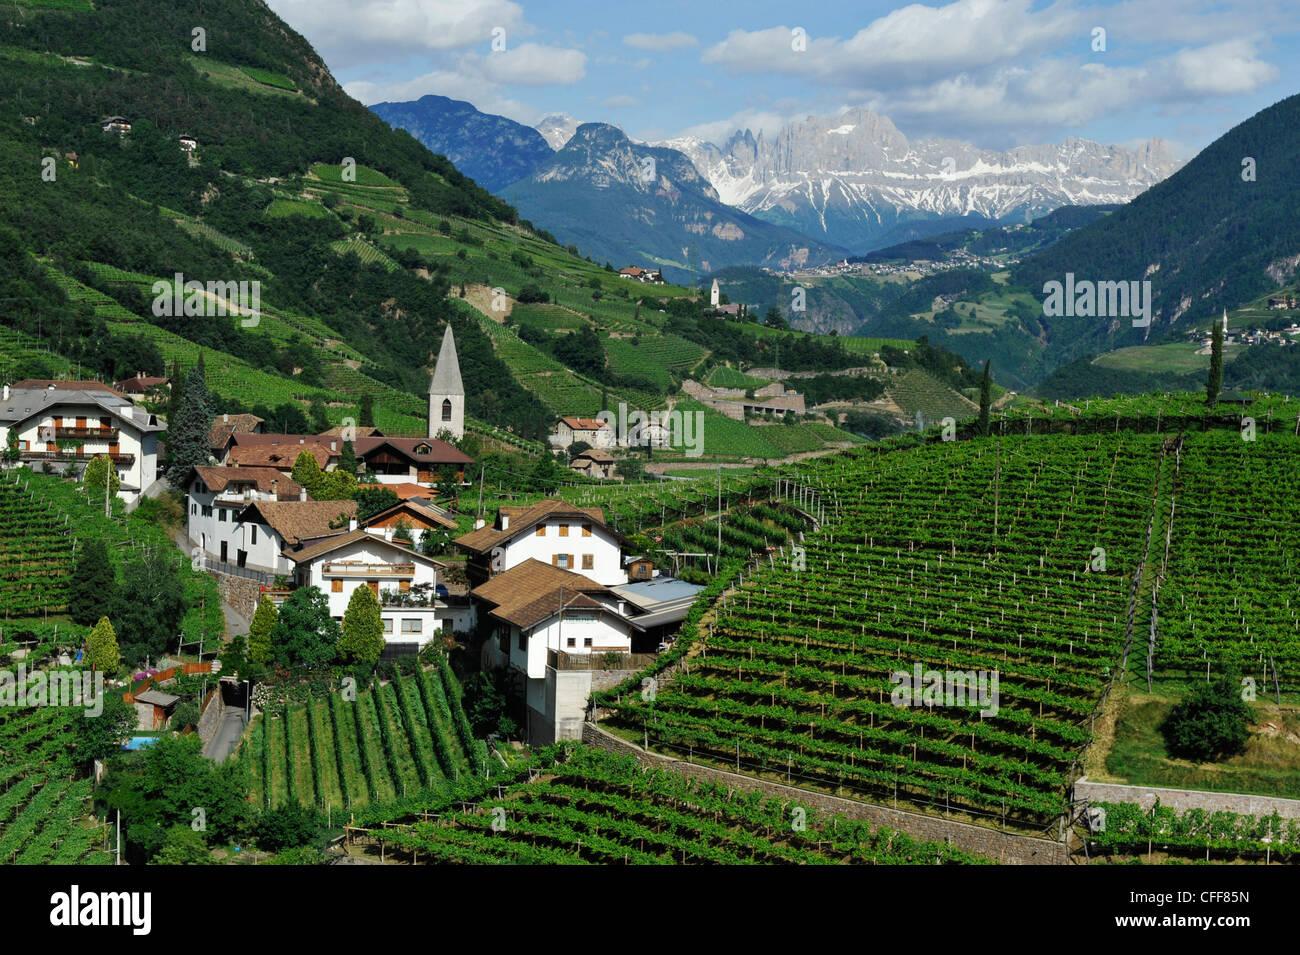 Vineyard and houses under clouded sky, Bolzano Rentsch, Dolomites, South Tyrol, Alto Adige, Italy, Europe - Stock Image